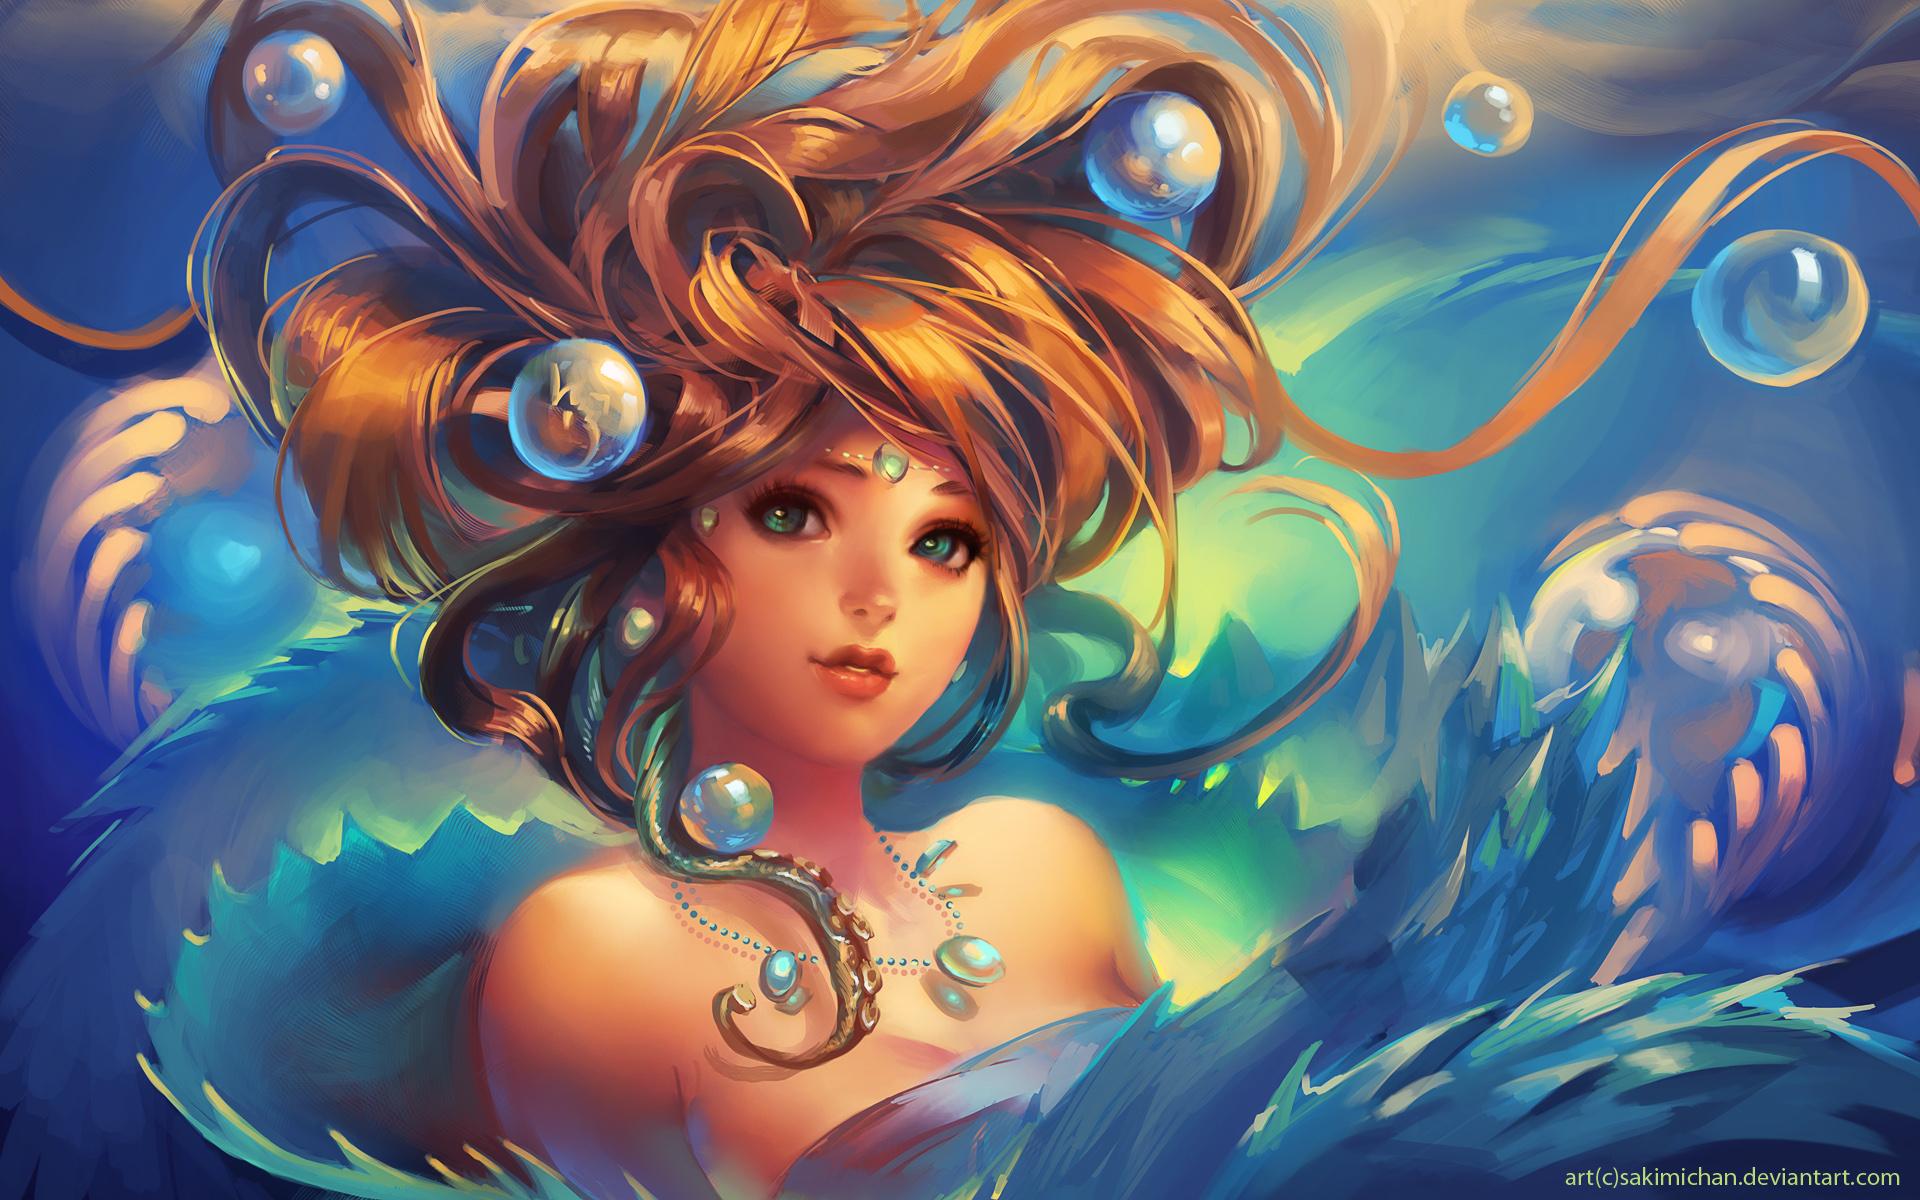 20+ Amazing & Beautiful Digital Art Desktop Wallpapers In HD